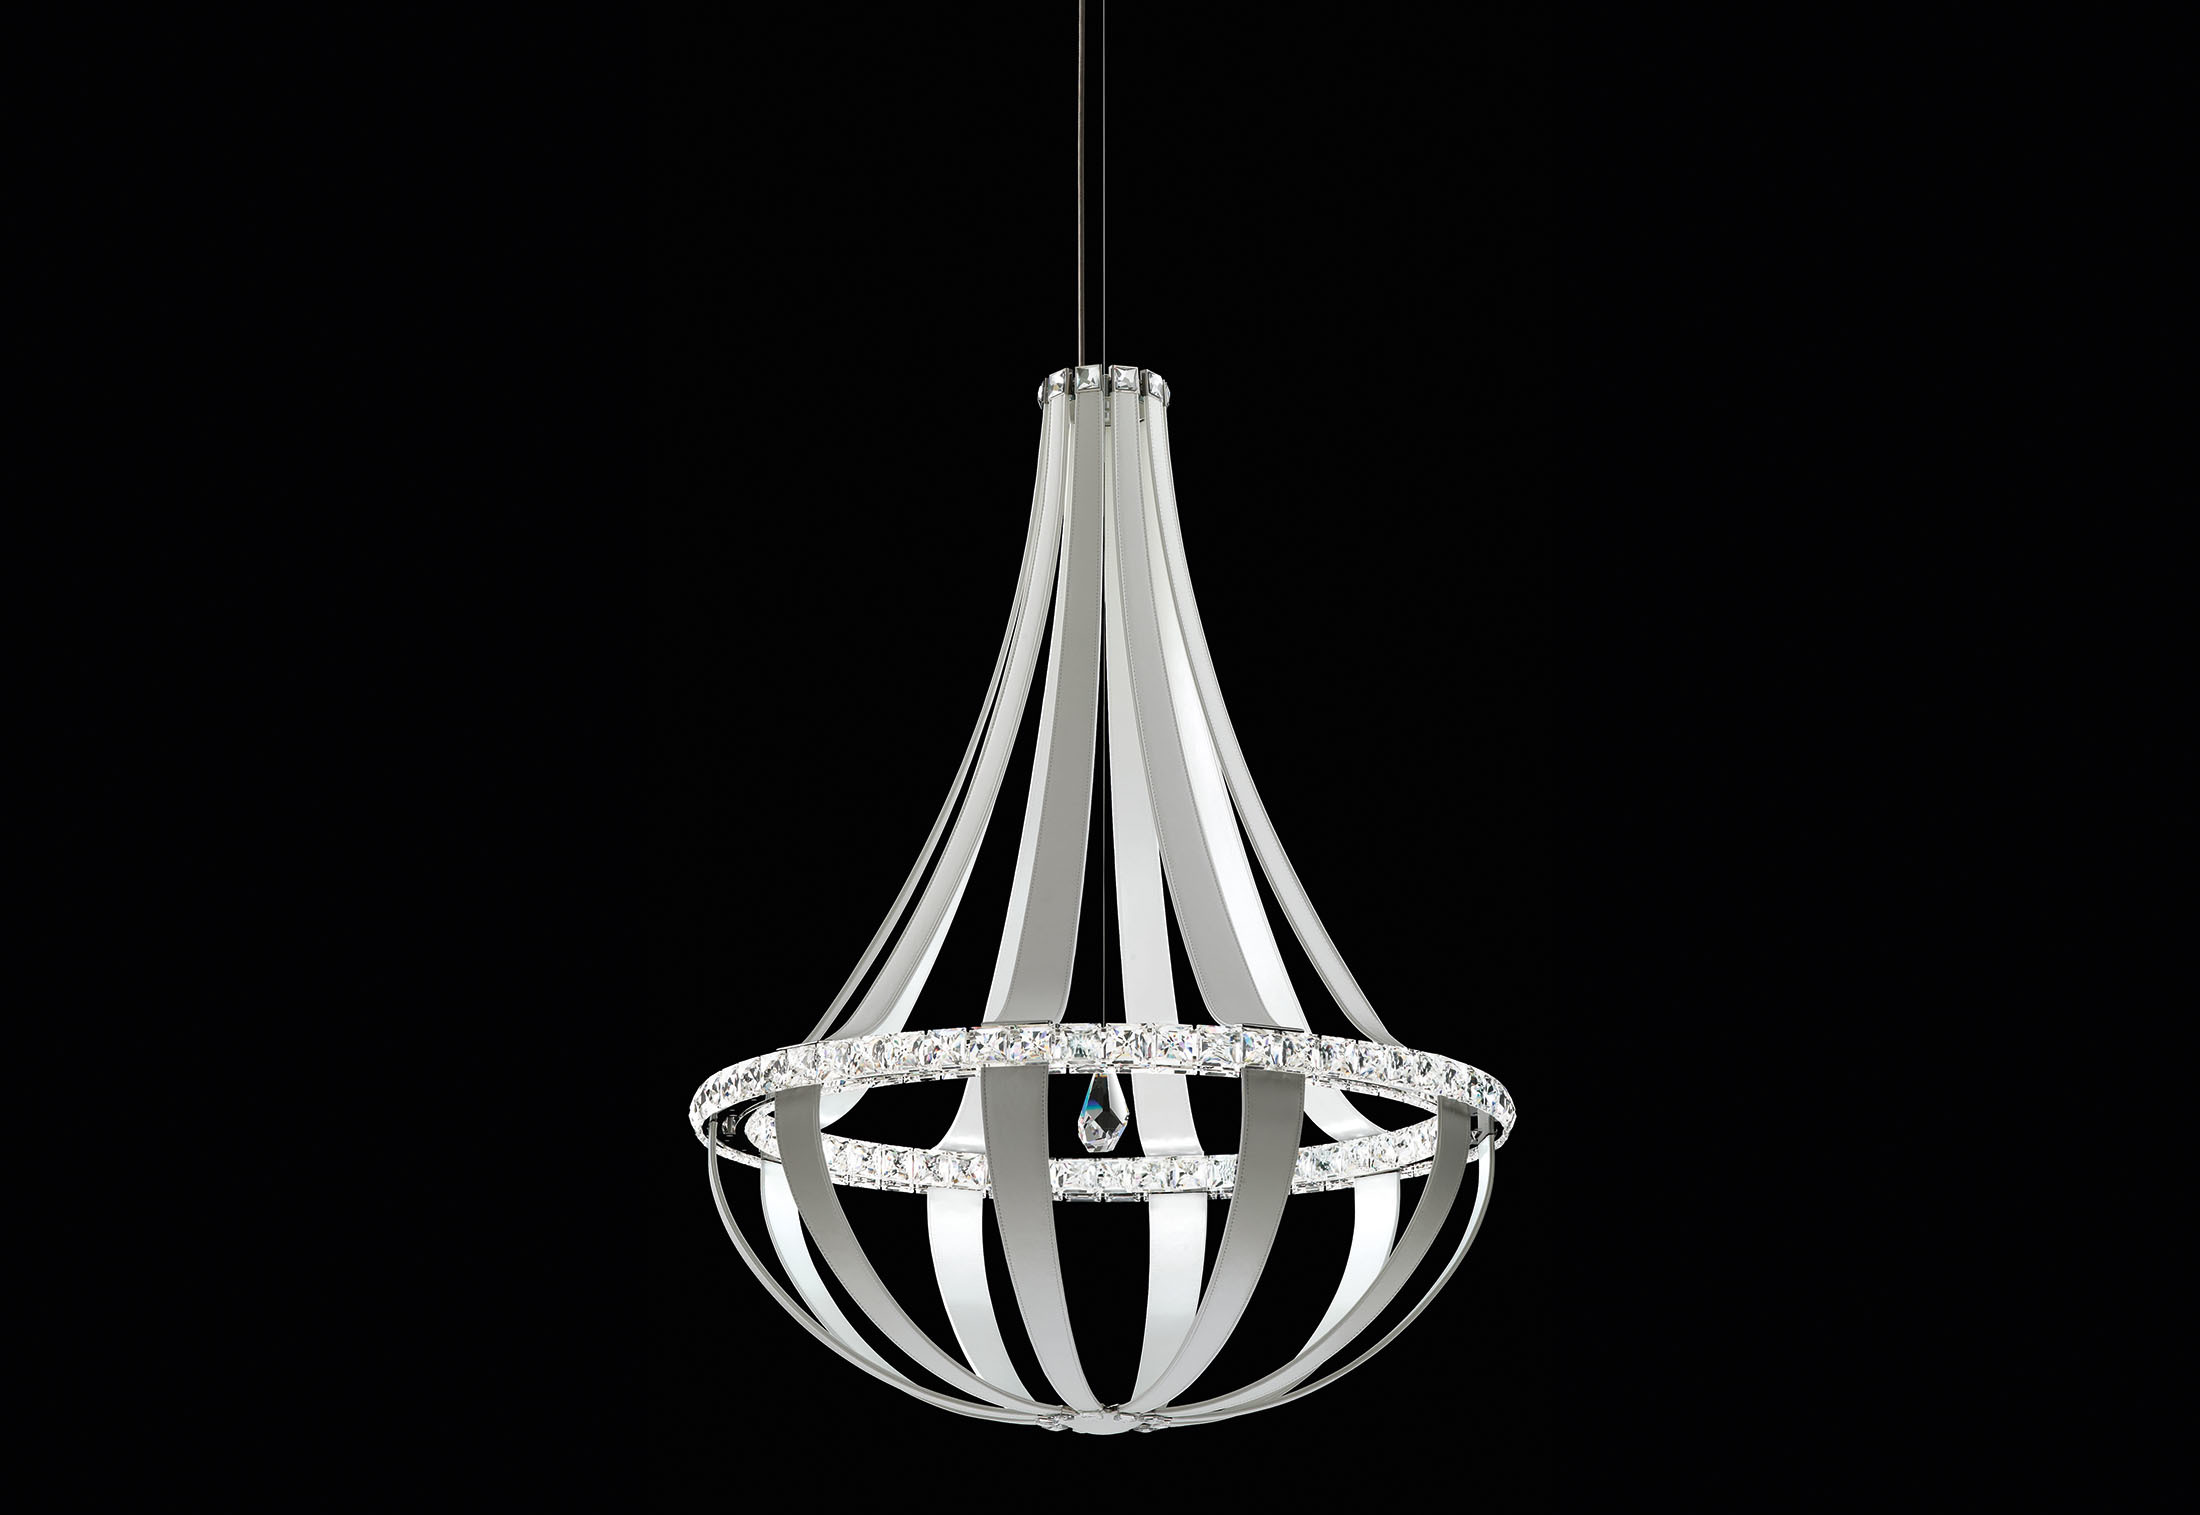 556dff4e5c CRYSTAL EMPIRE by Swarovski Lighting   STYLEPARK